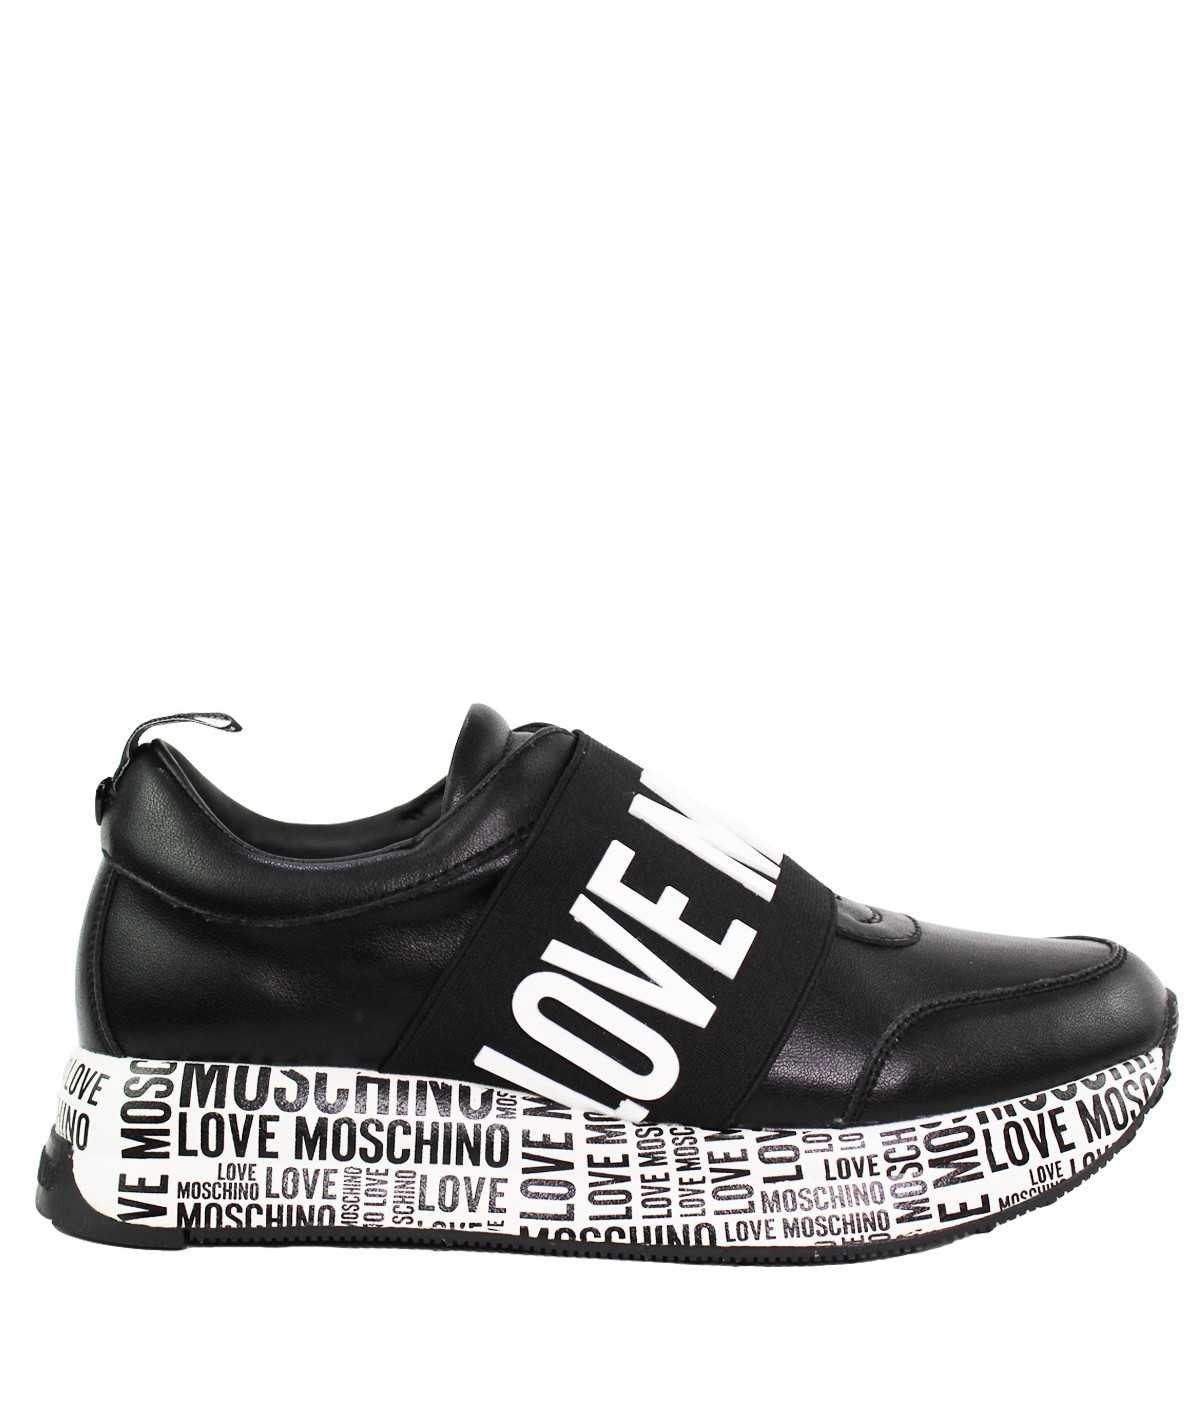 LOVE MOSCHINO Sneakers...